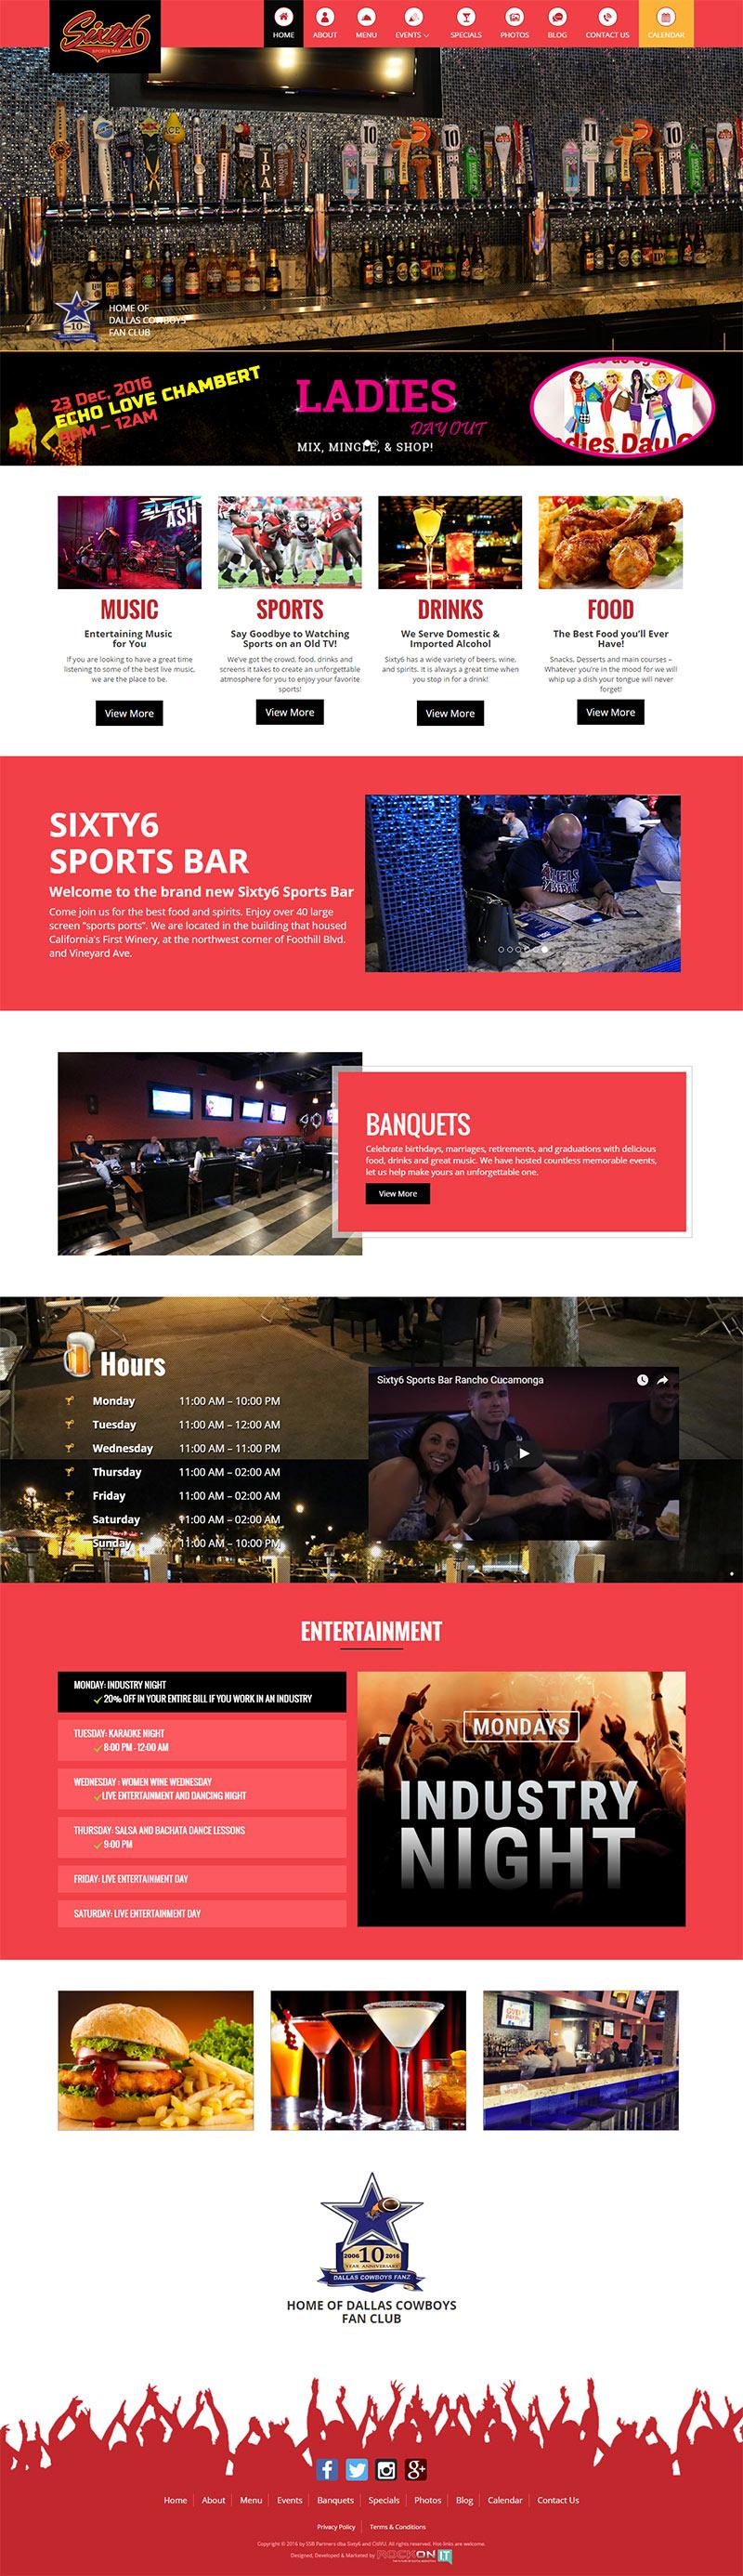 Sixty6 Sports Bar